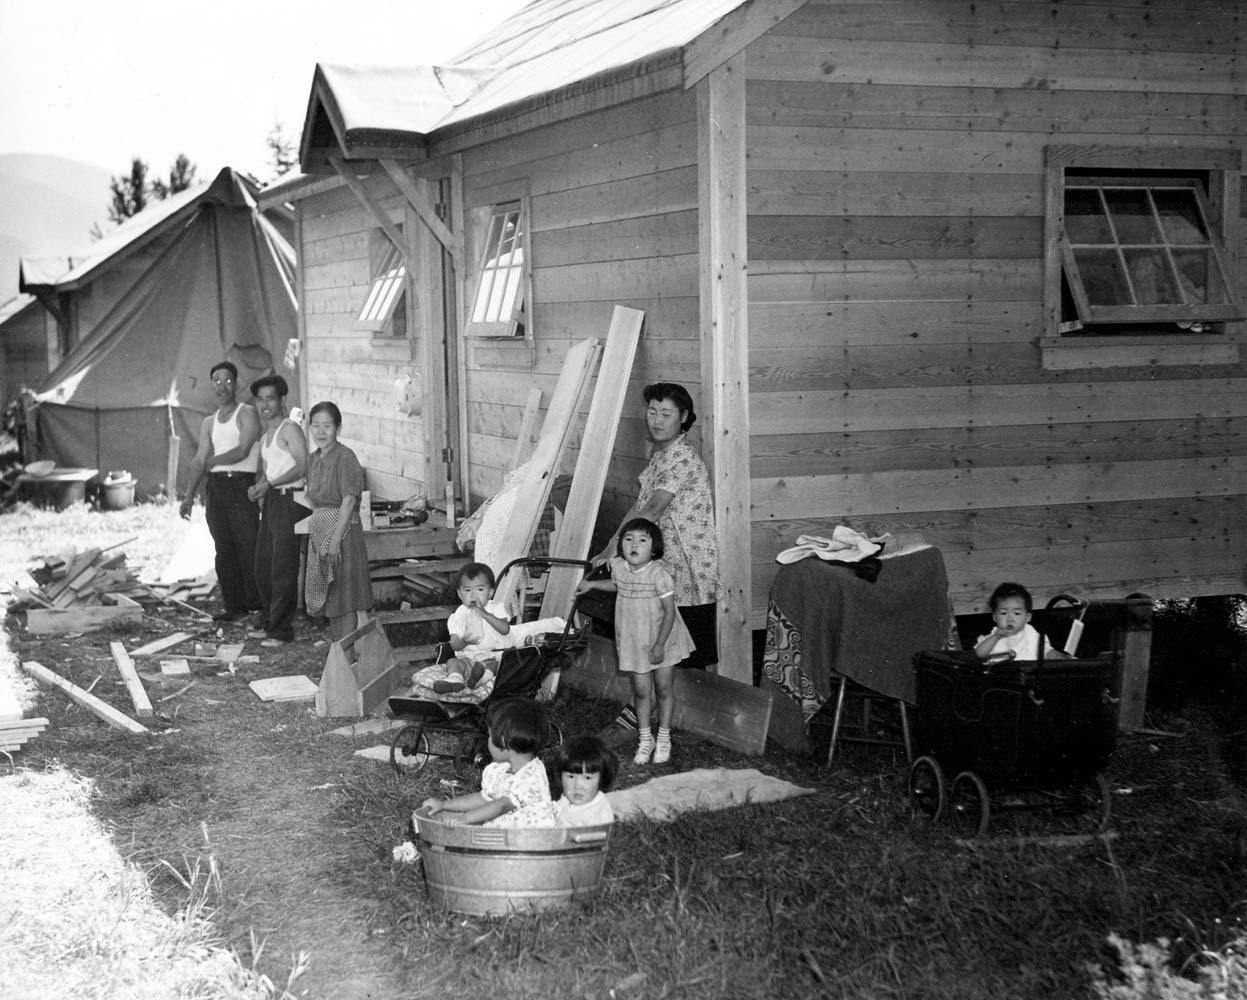 Leonard Frank photo